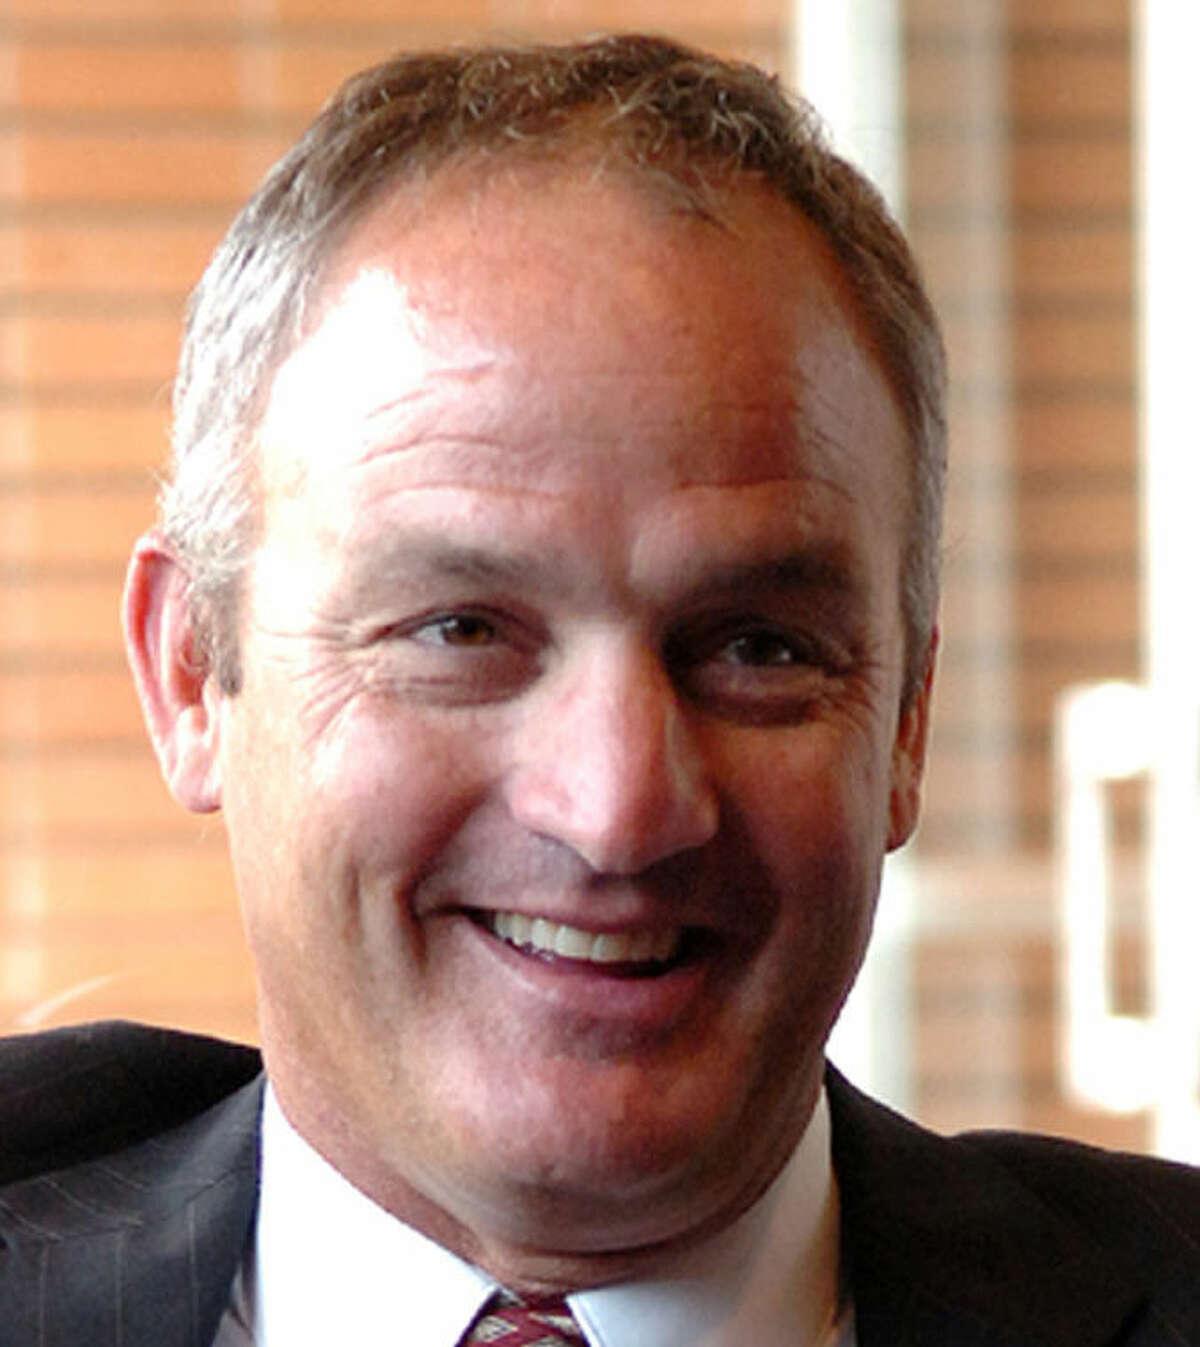 MISD Athletic Director Todd Howey